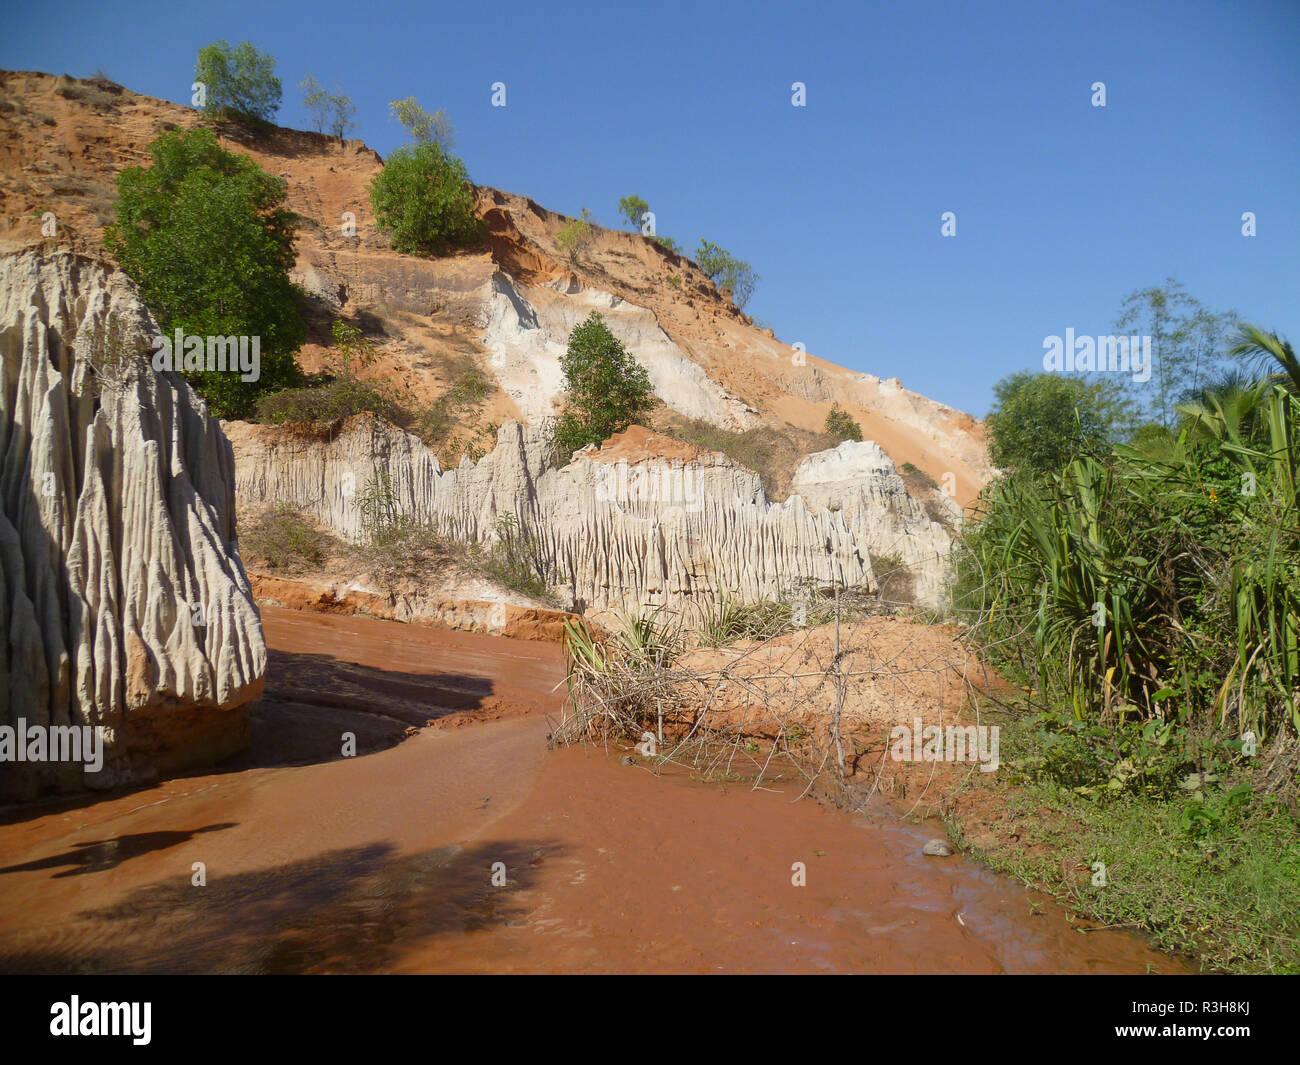 phan thiet - vietnam / red sand dunes - Stock Image